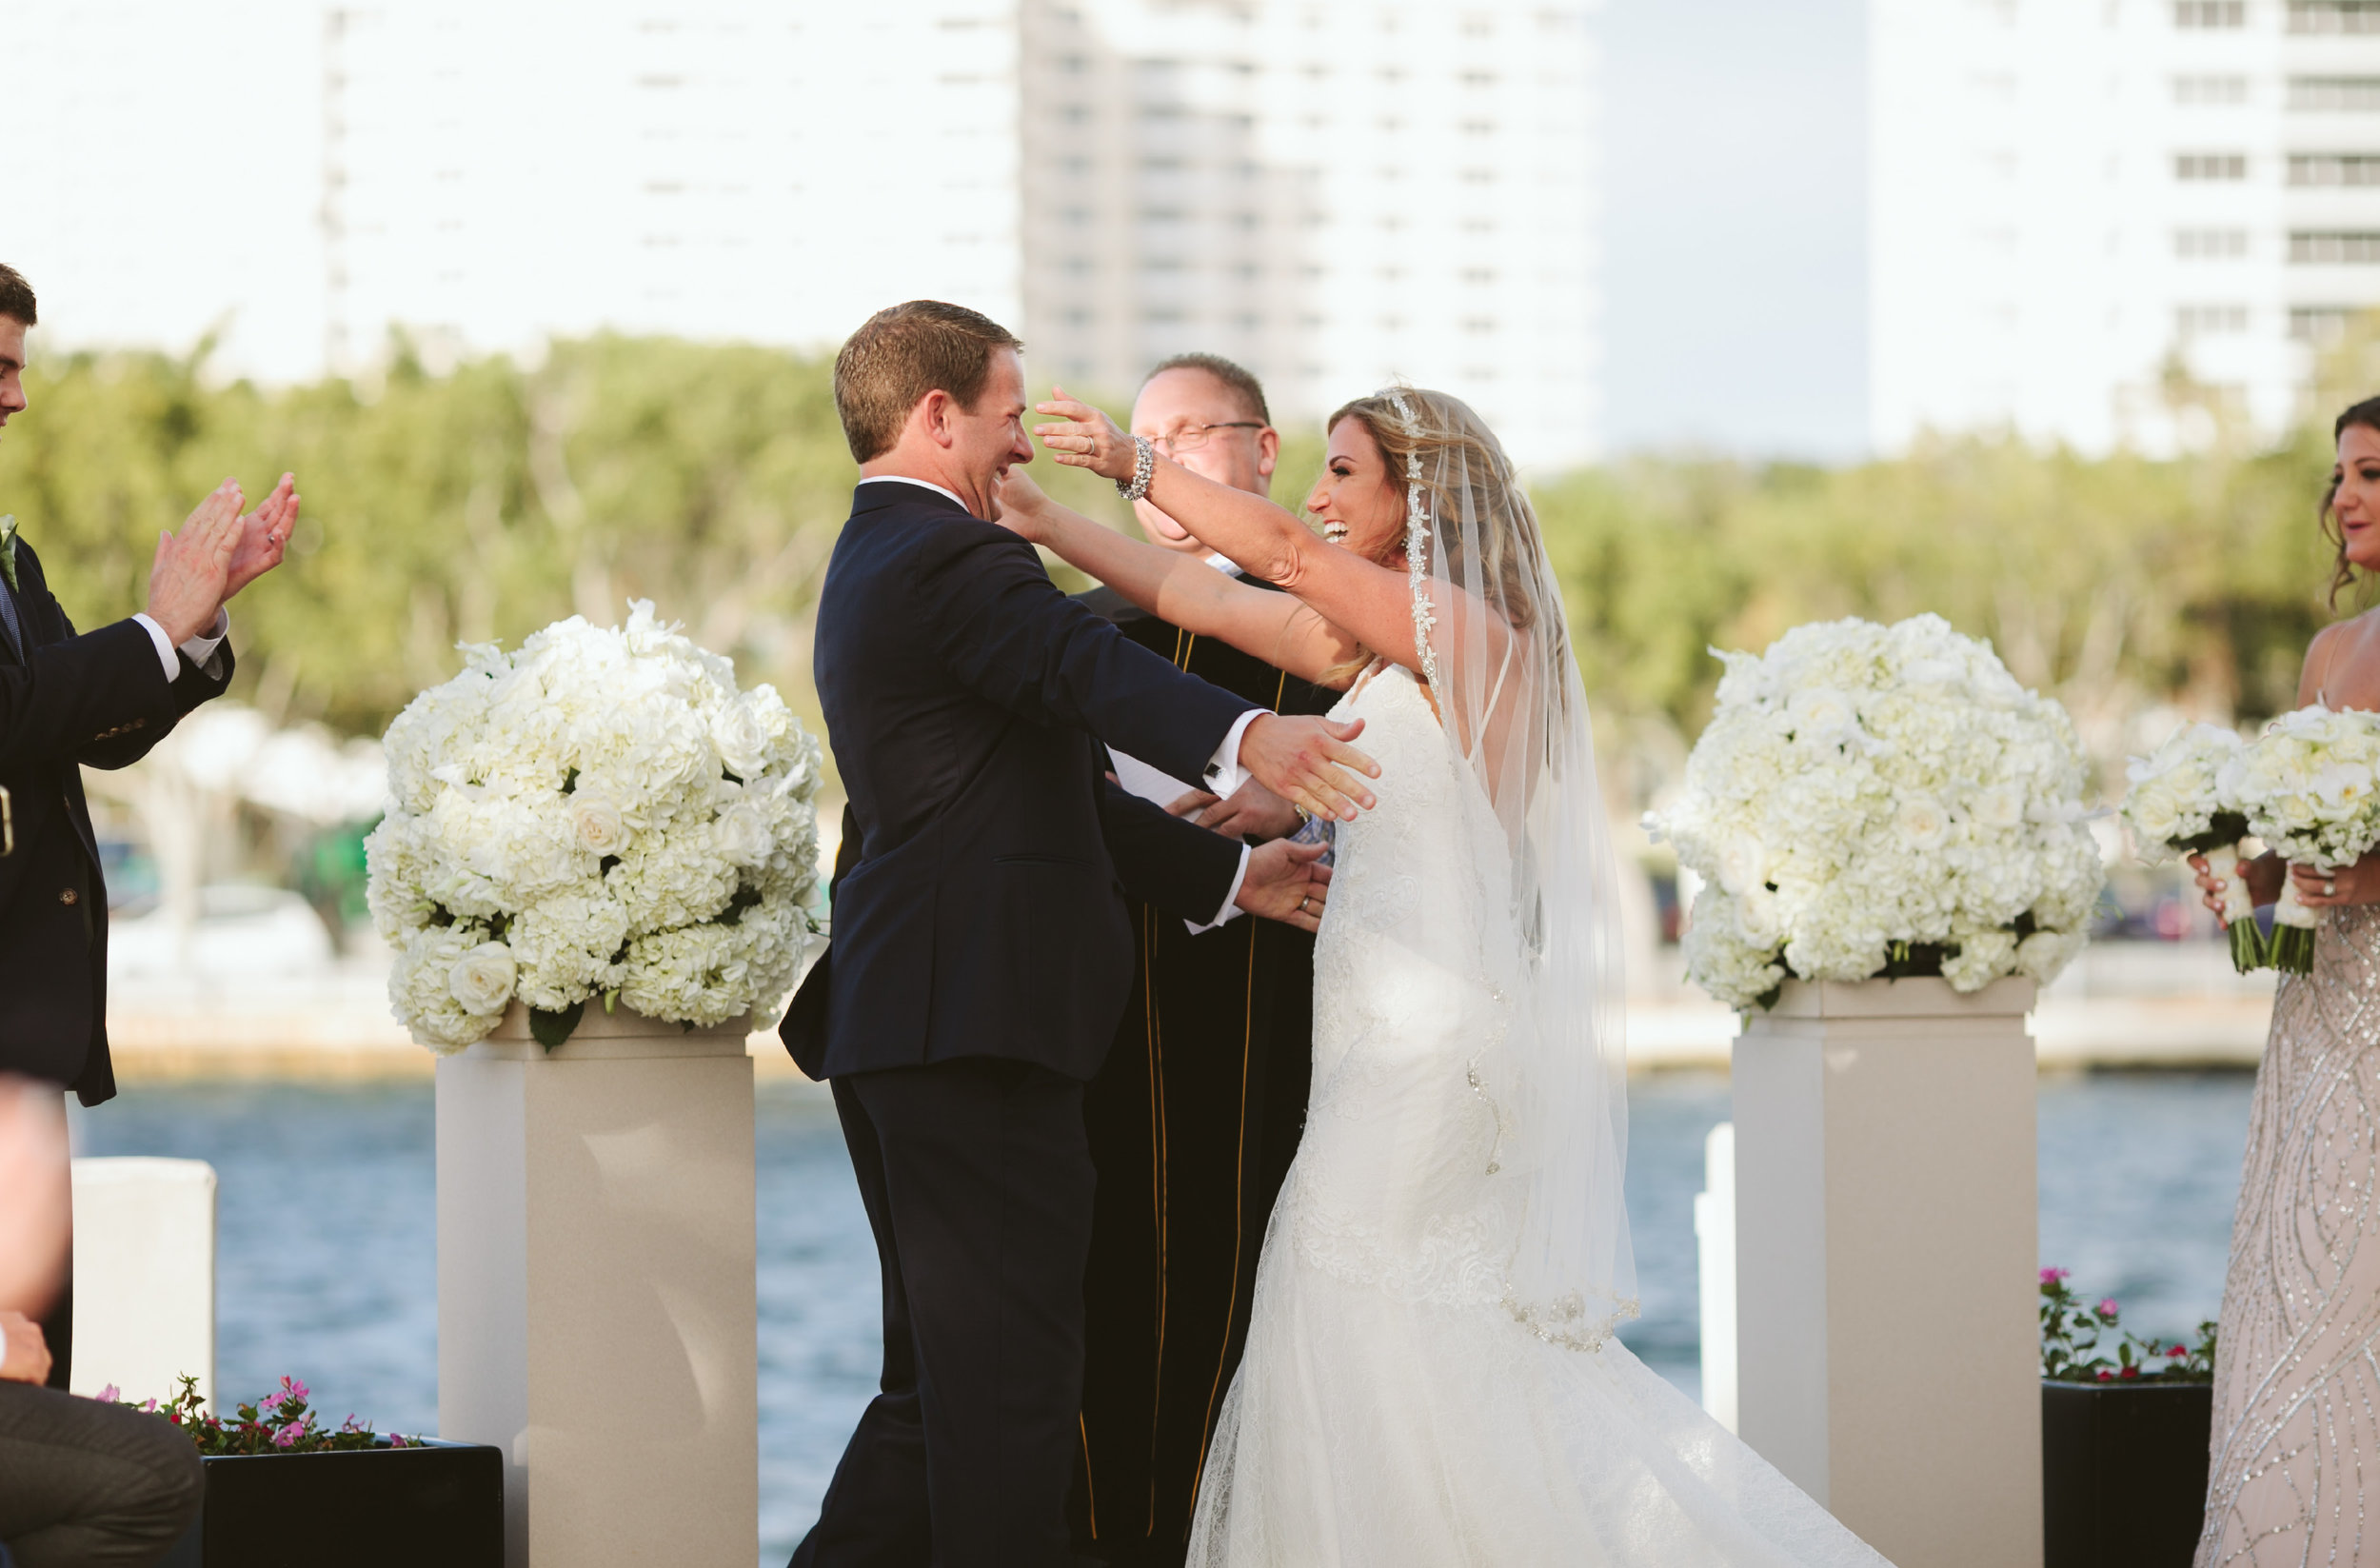 Kim + John's Wedding at the Waterstone Hotel in Boca Raton54.jpg